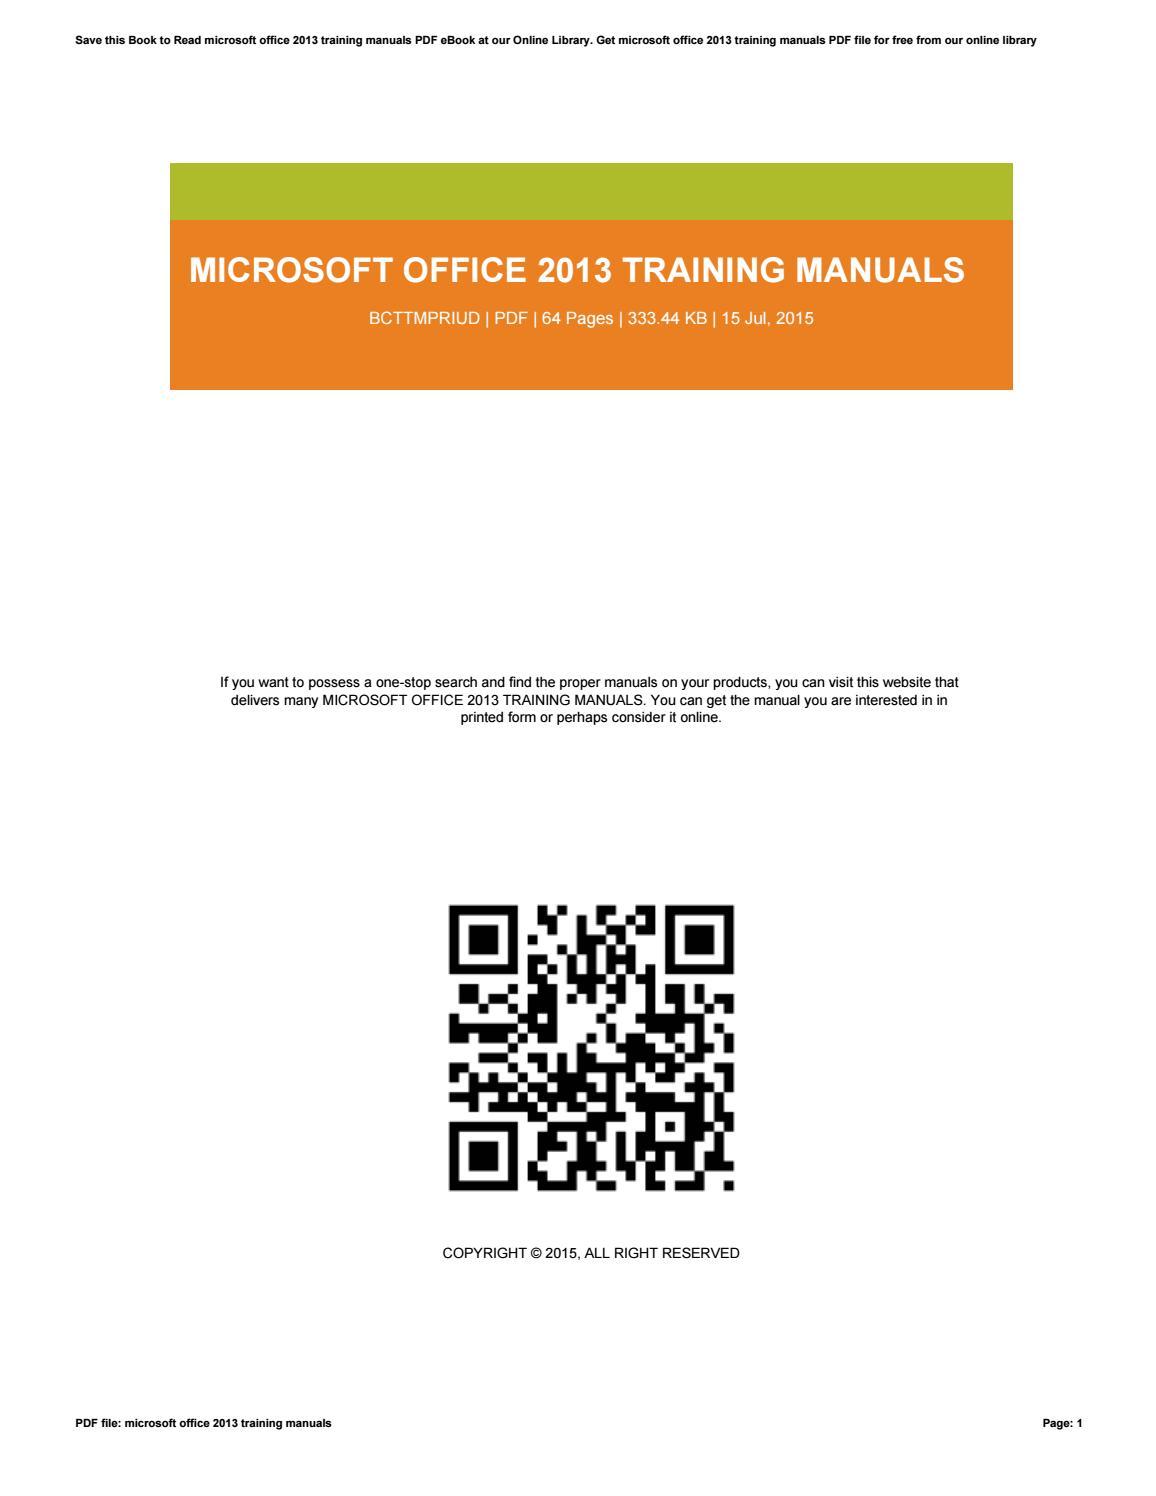 Array - microsoft office 2013 training manuals by jakeespinoza4721 issuu rh  issuu ...